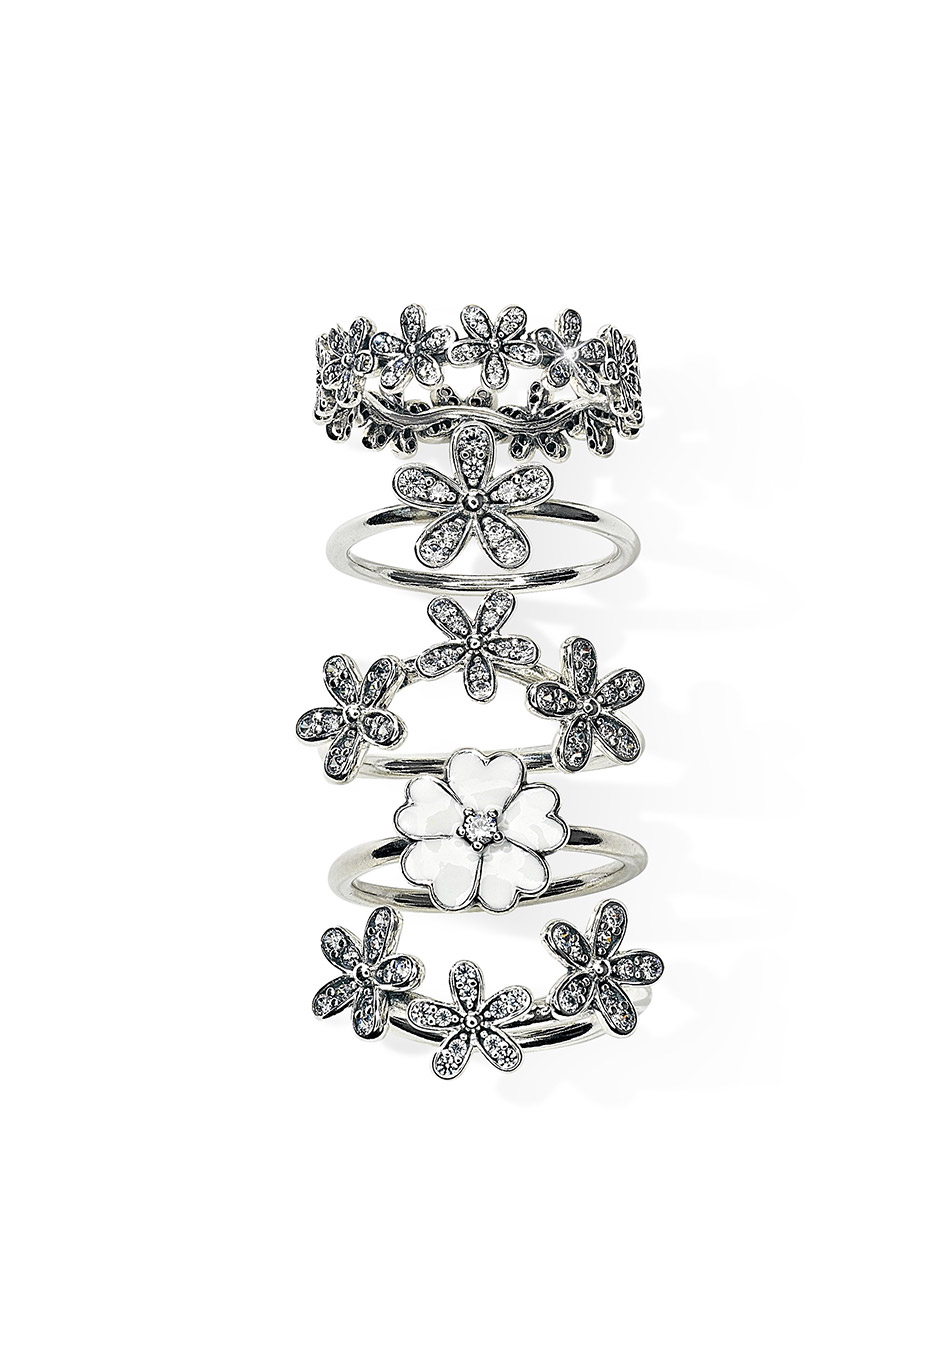 b97d02c6c ... new arrivals pandora rings dazzling daisy pandora daisy stacking ring  4759f 44641